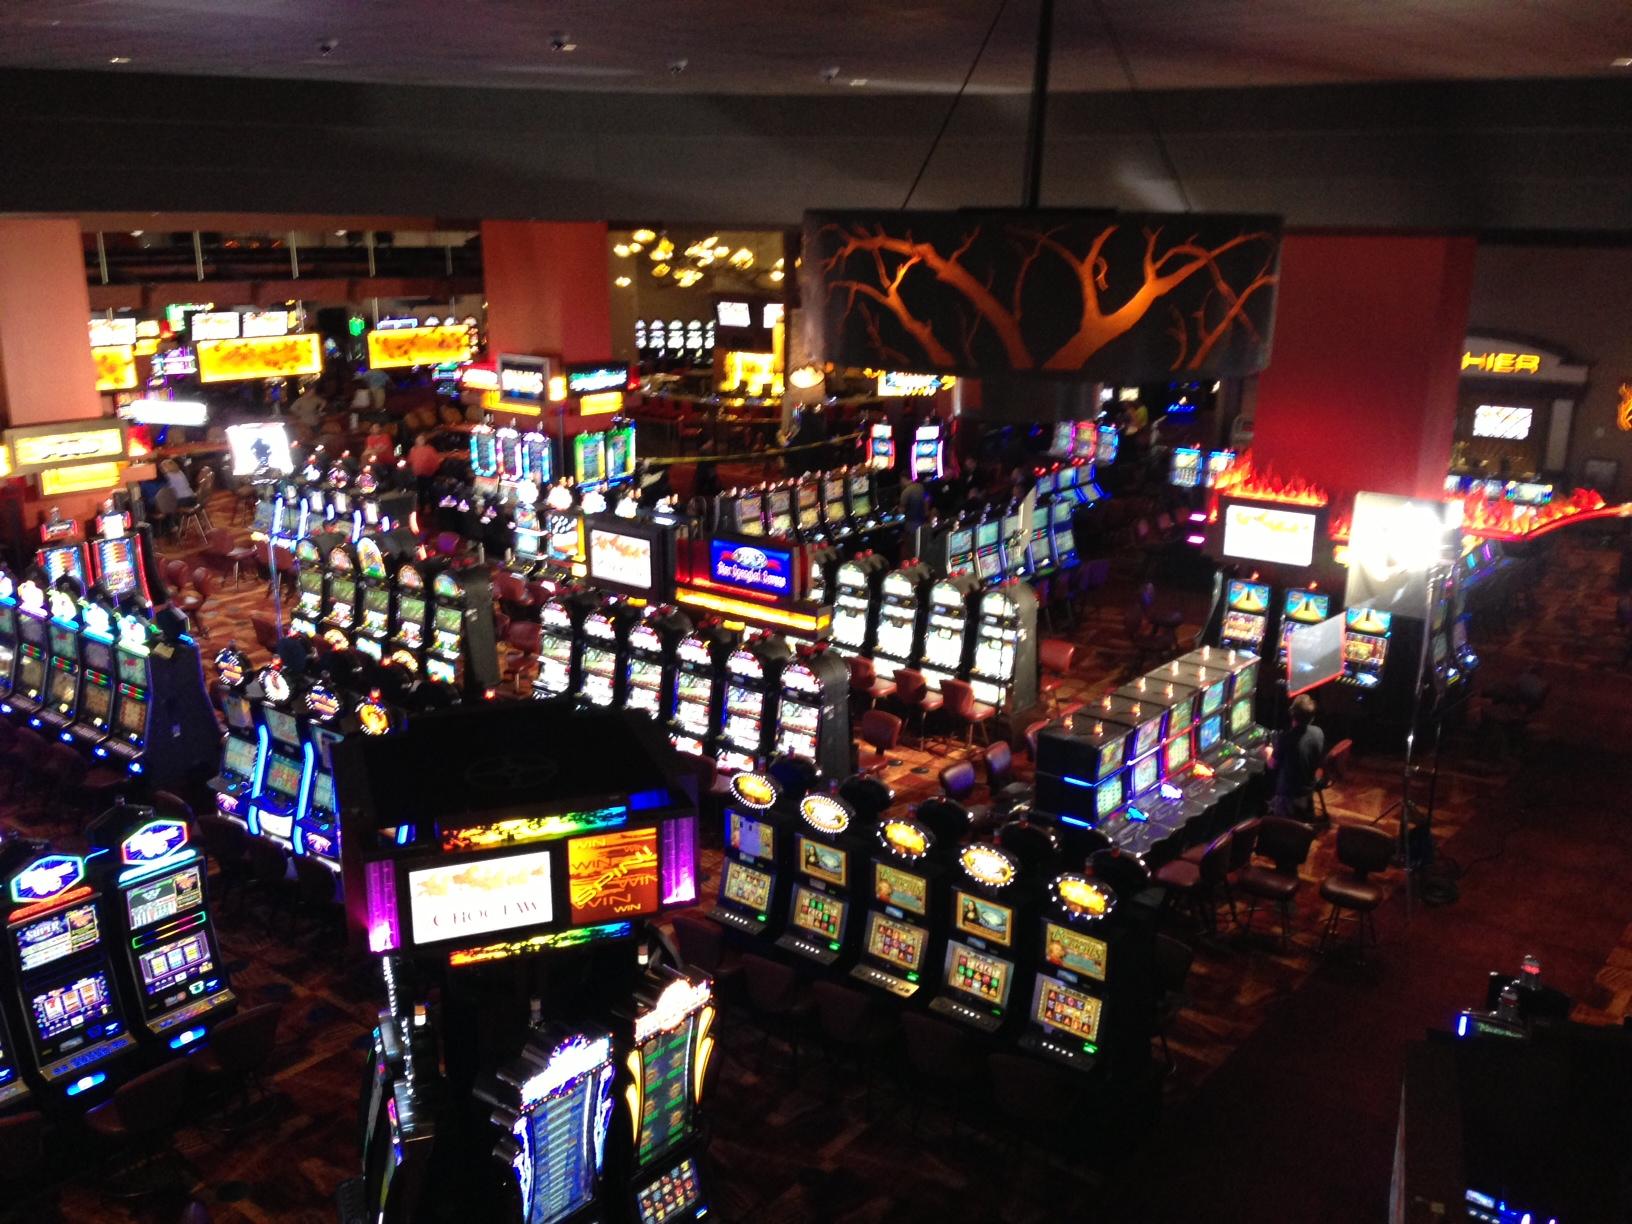 images of teenage gambling